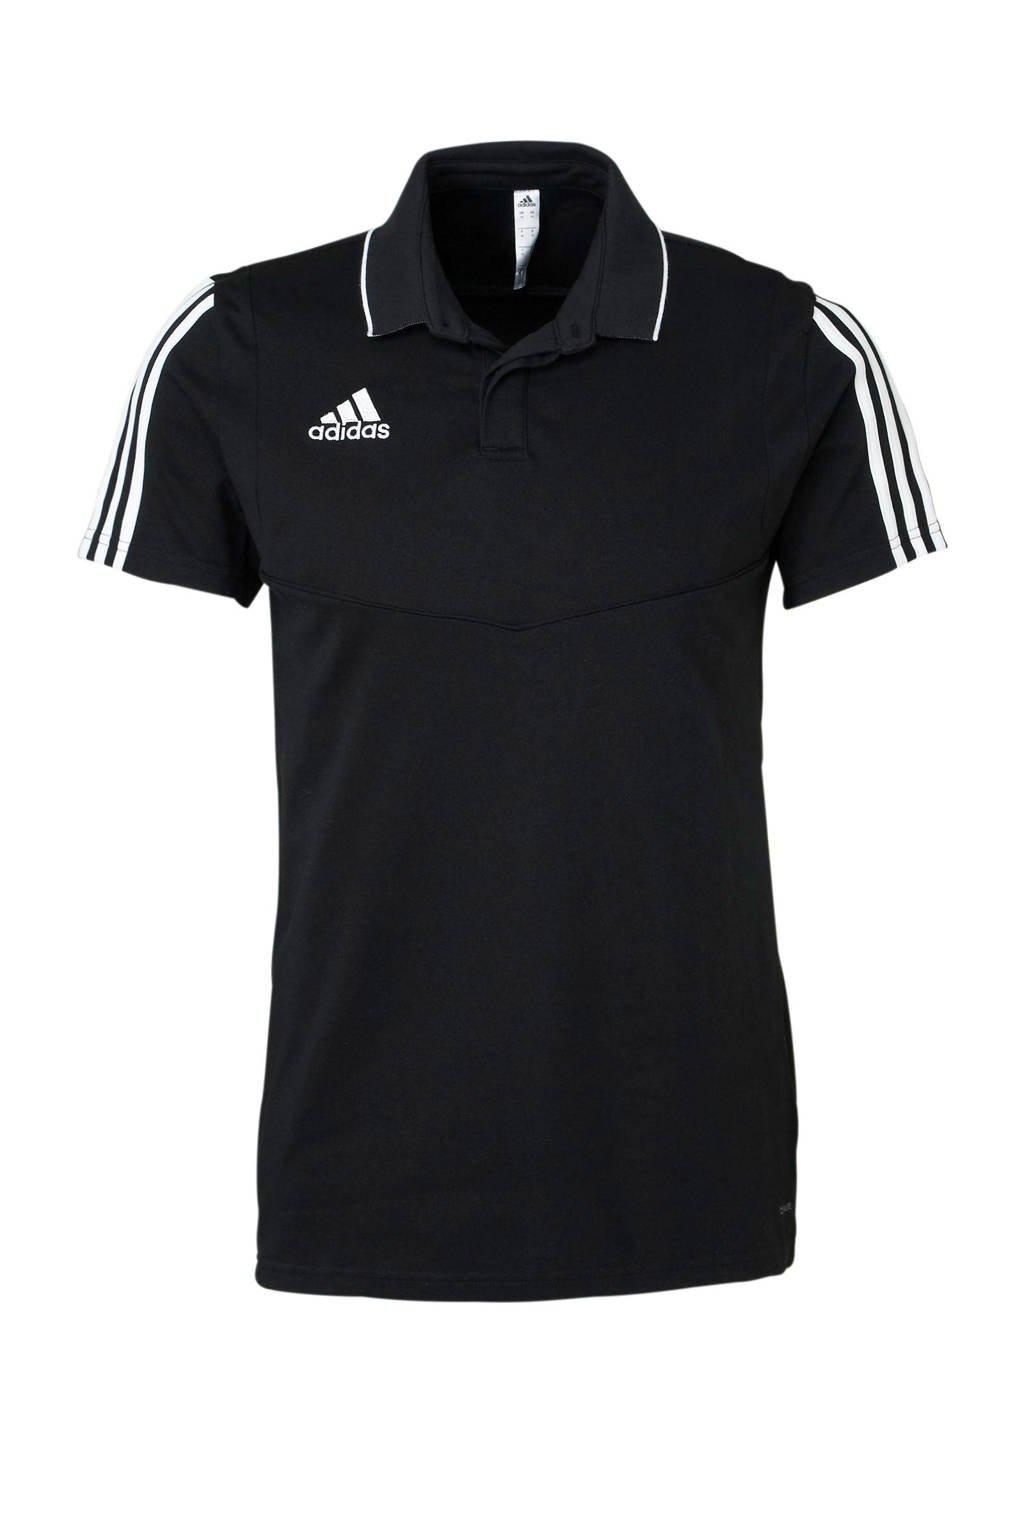 adidas Performance   sportpolo Tiro 19 zwart, Zwart